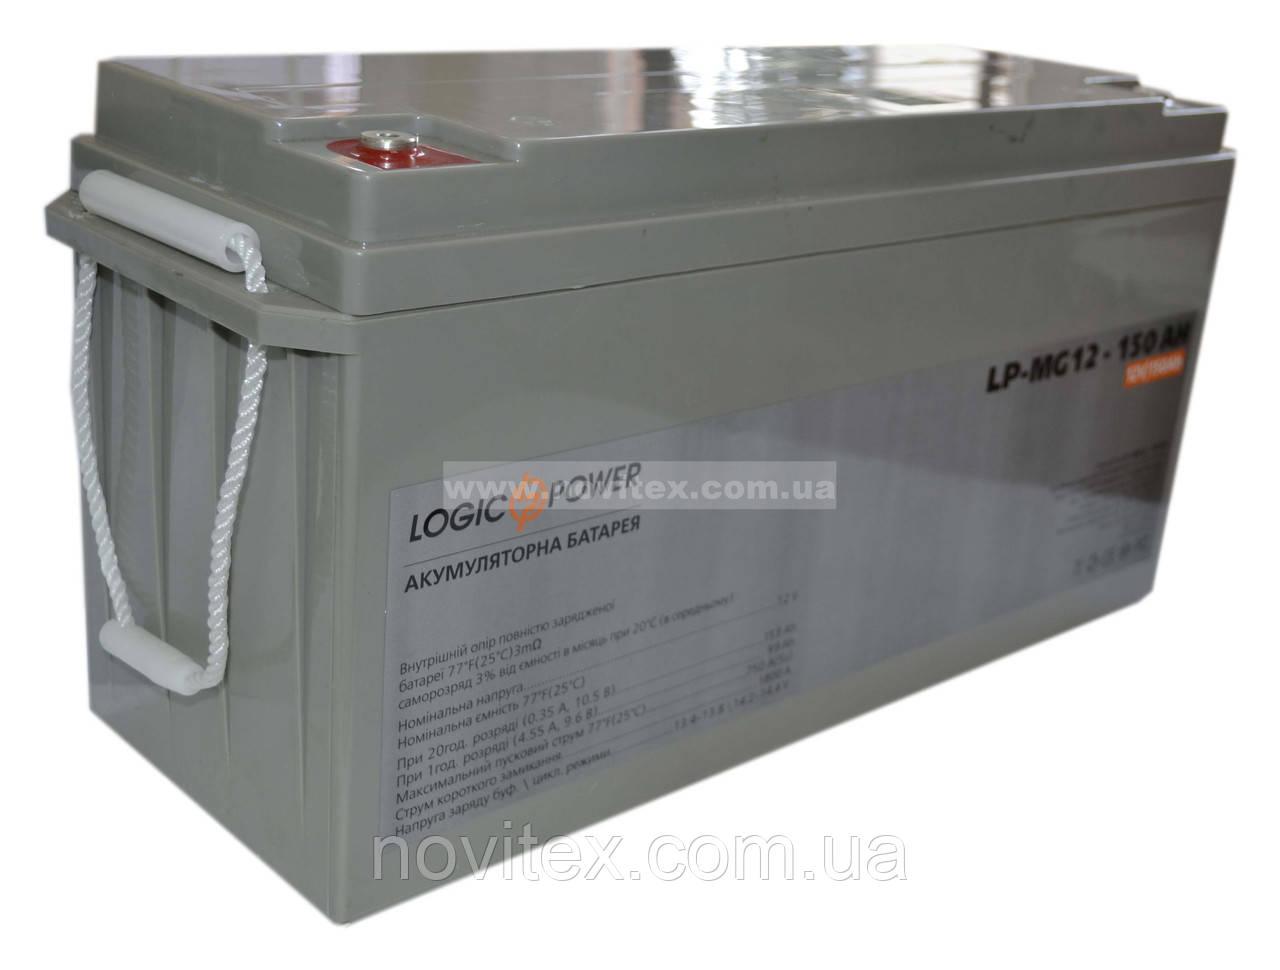 Аккумулятор мультигелевый Logicpower LPM-MG 12V 150AH